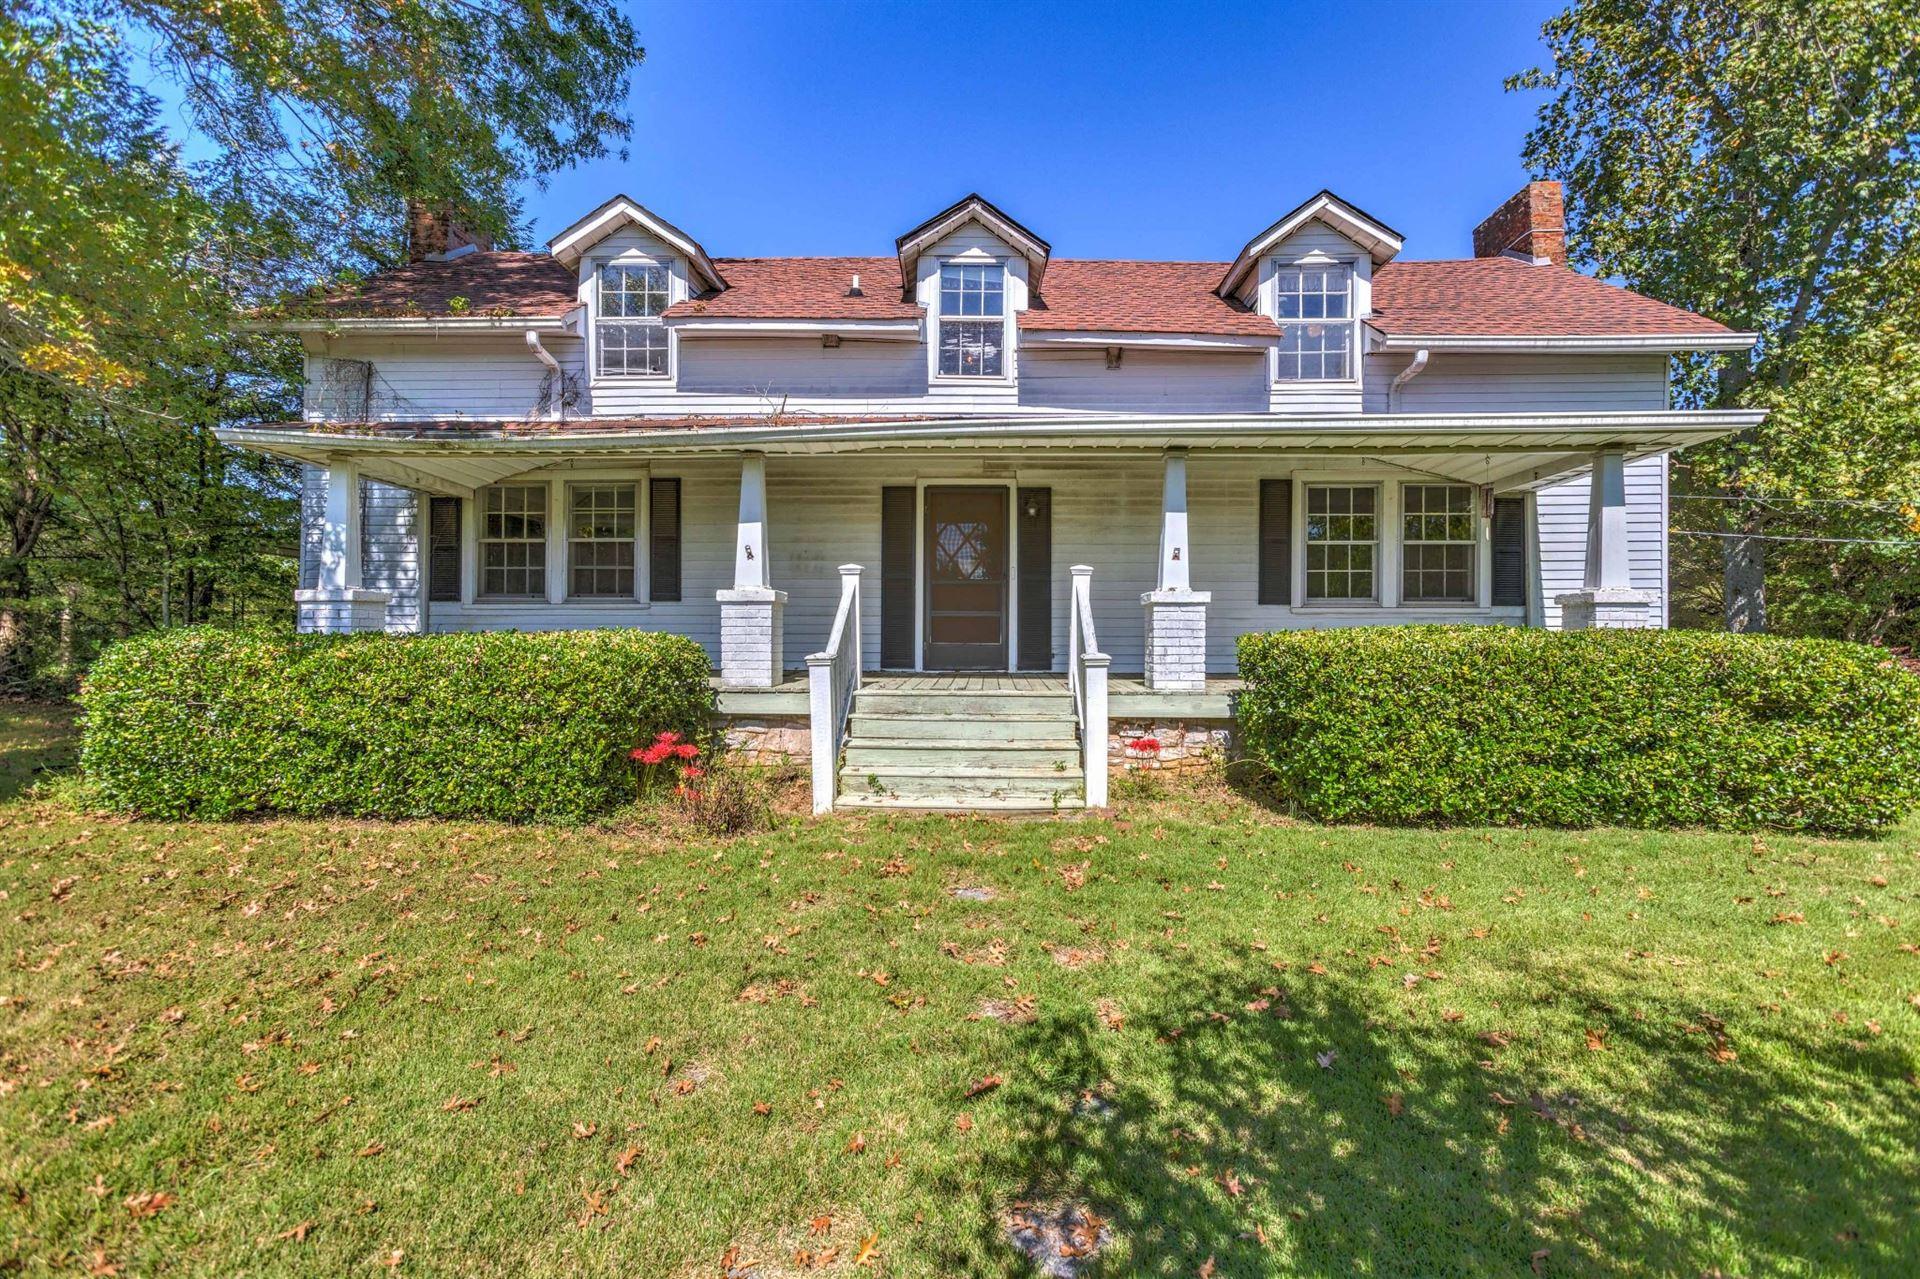 2554 Country Club Lane, Columbia, TN 38401 - MLS#: 2195472